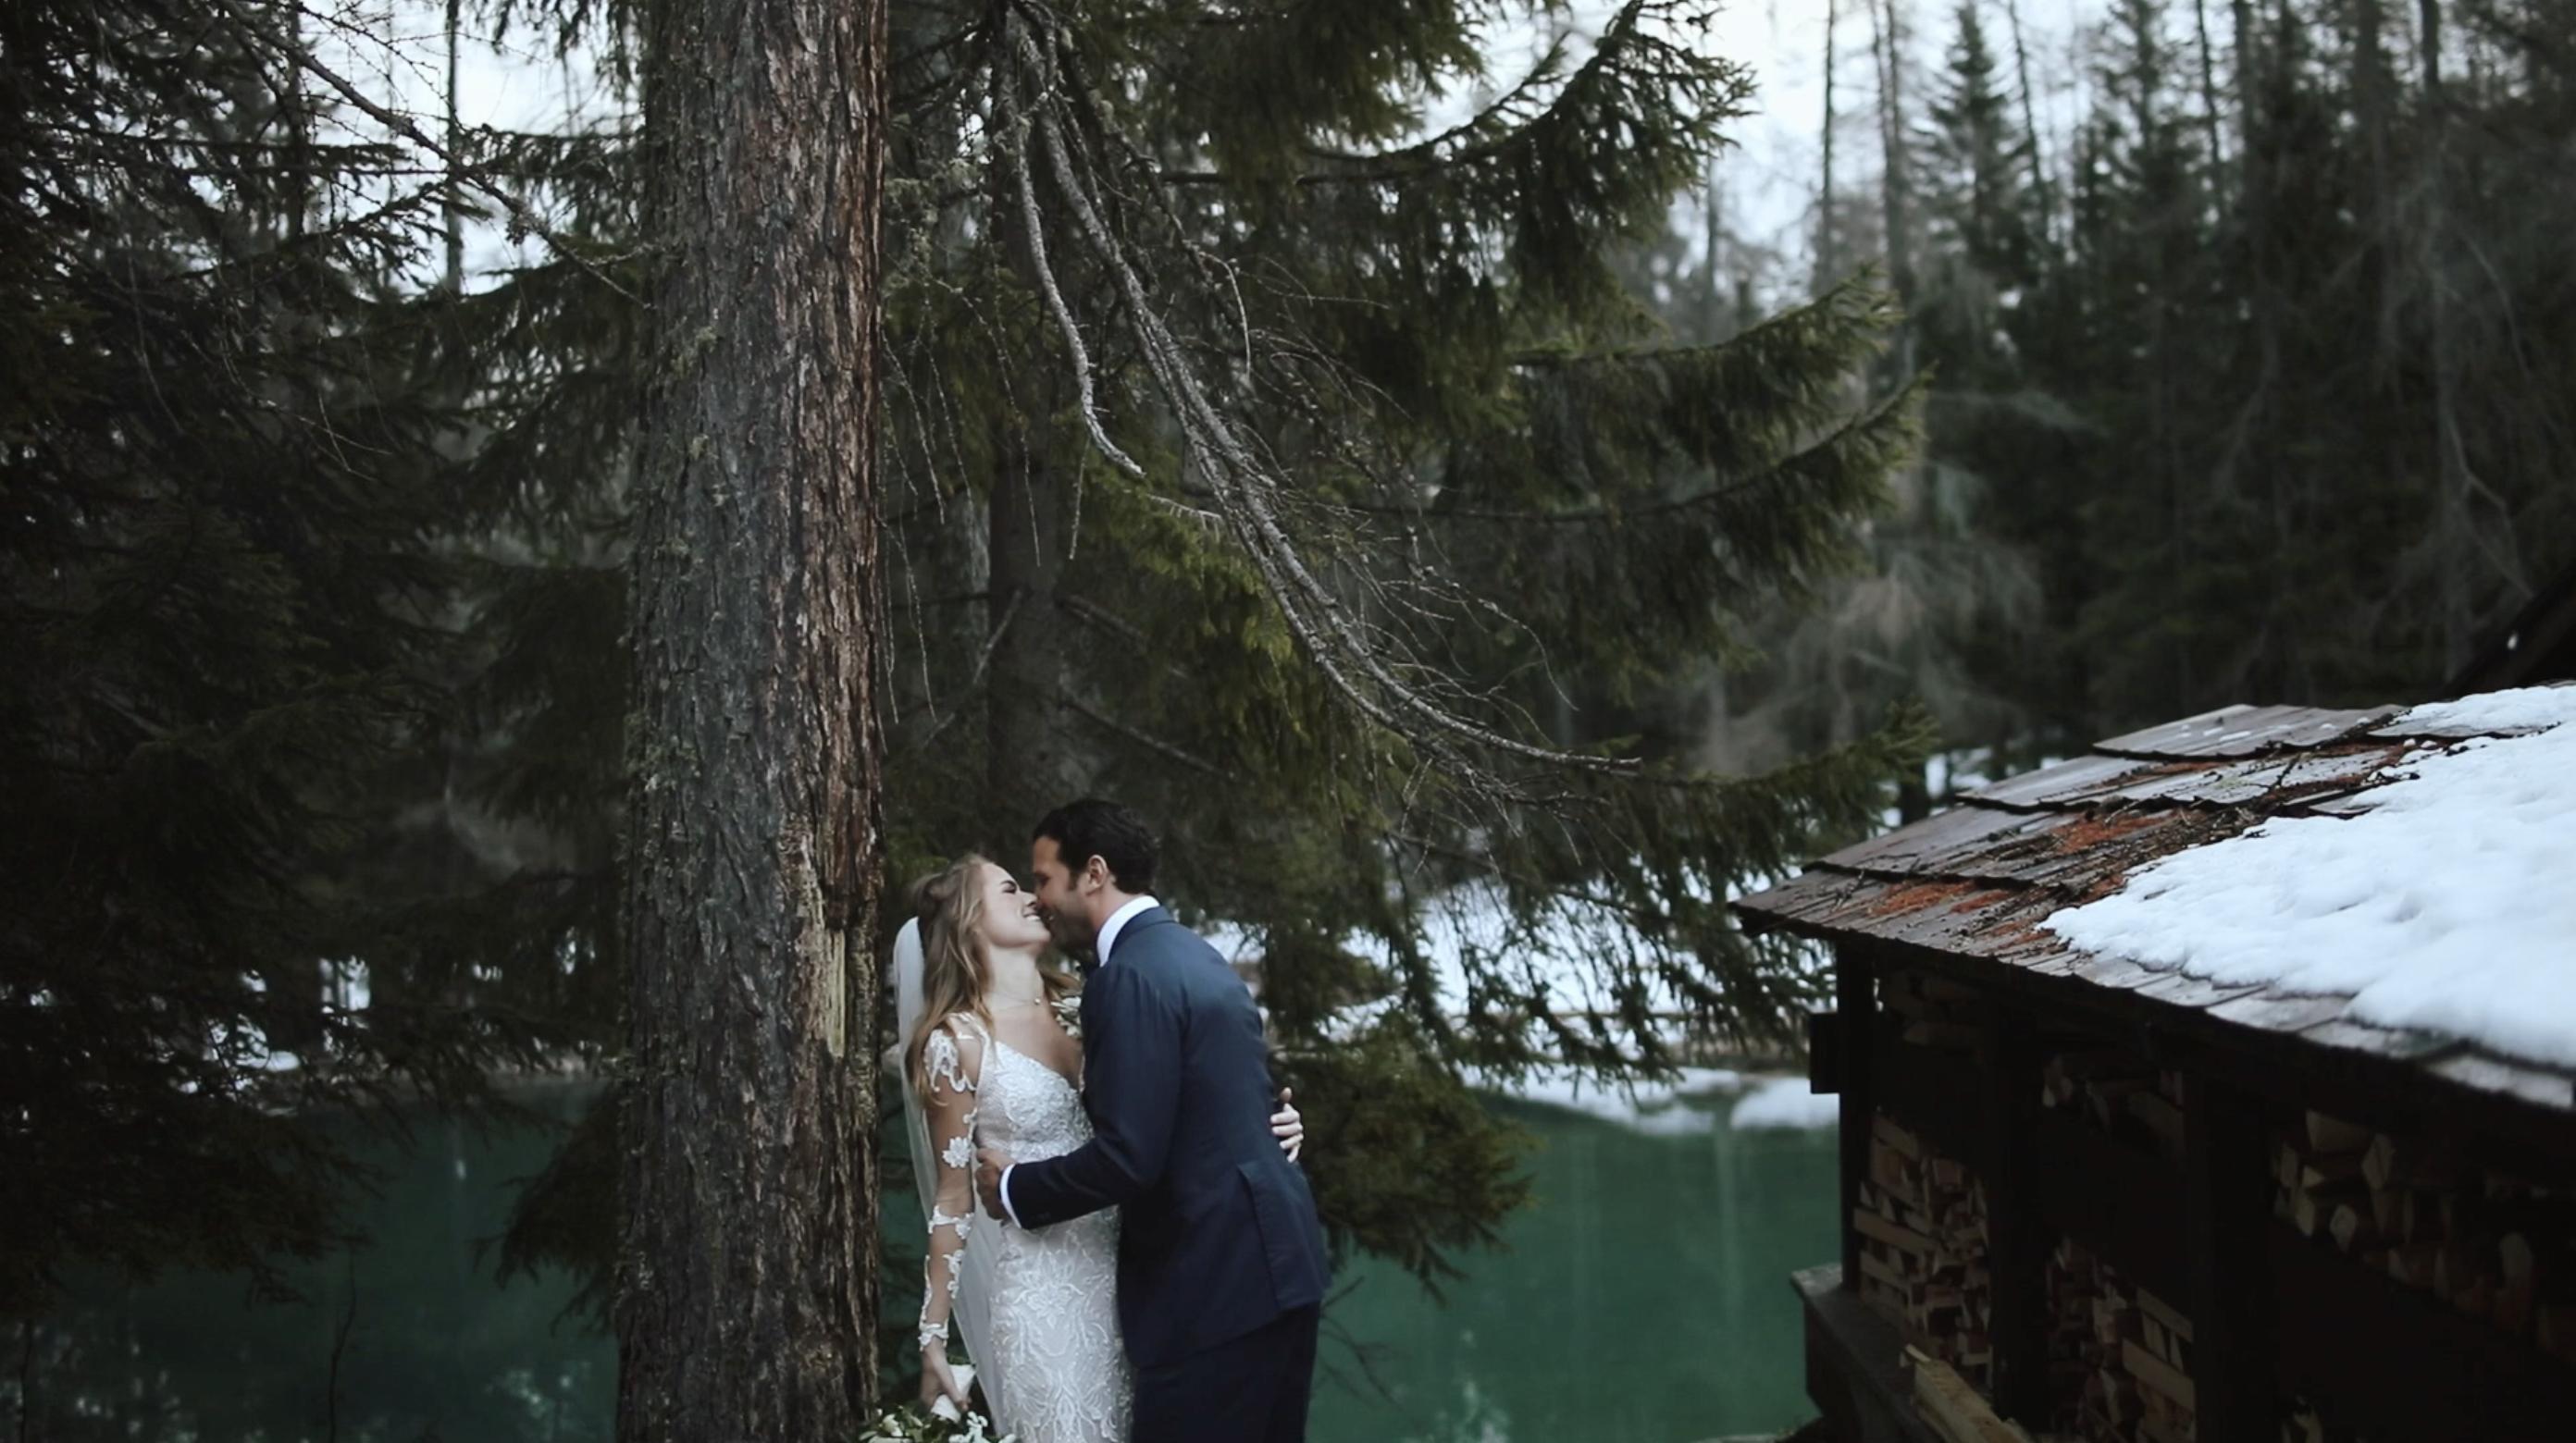 Rosanne + Dexter | Cortina d'Ampezzo, Italy | Lago Ghedina